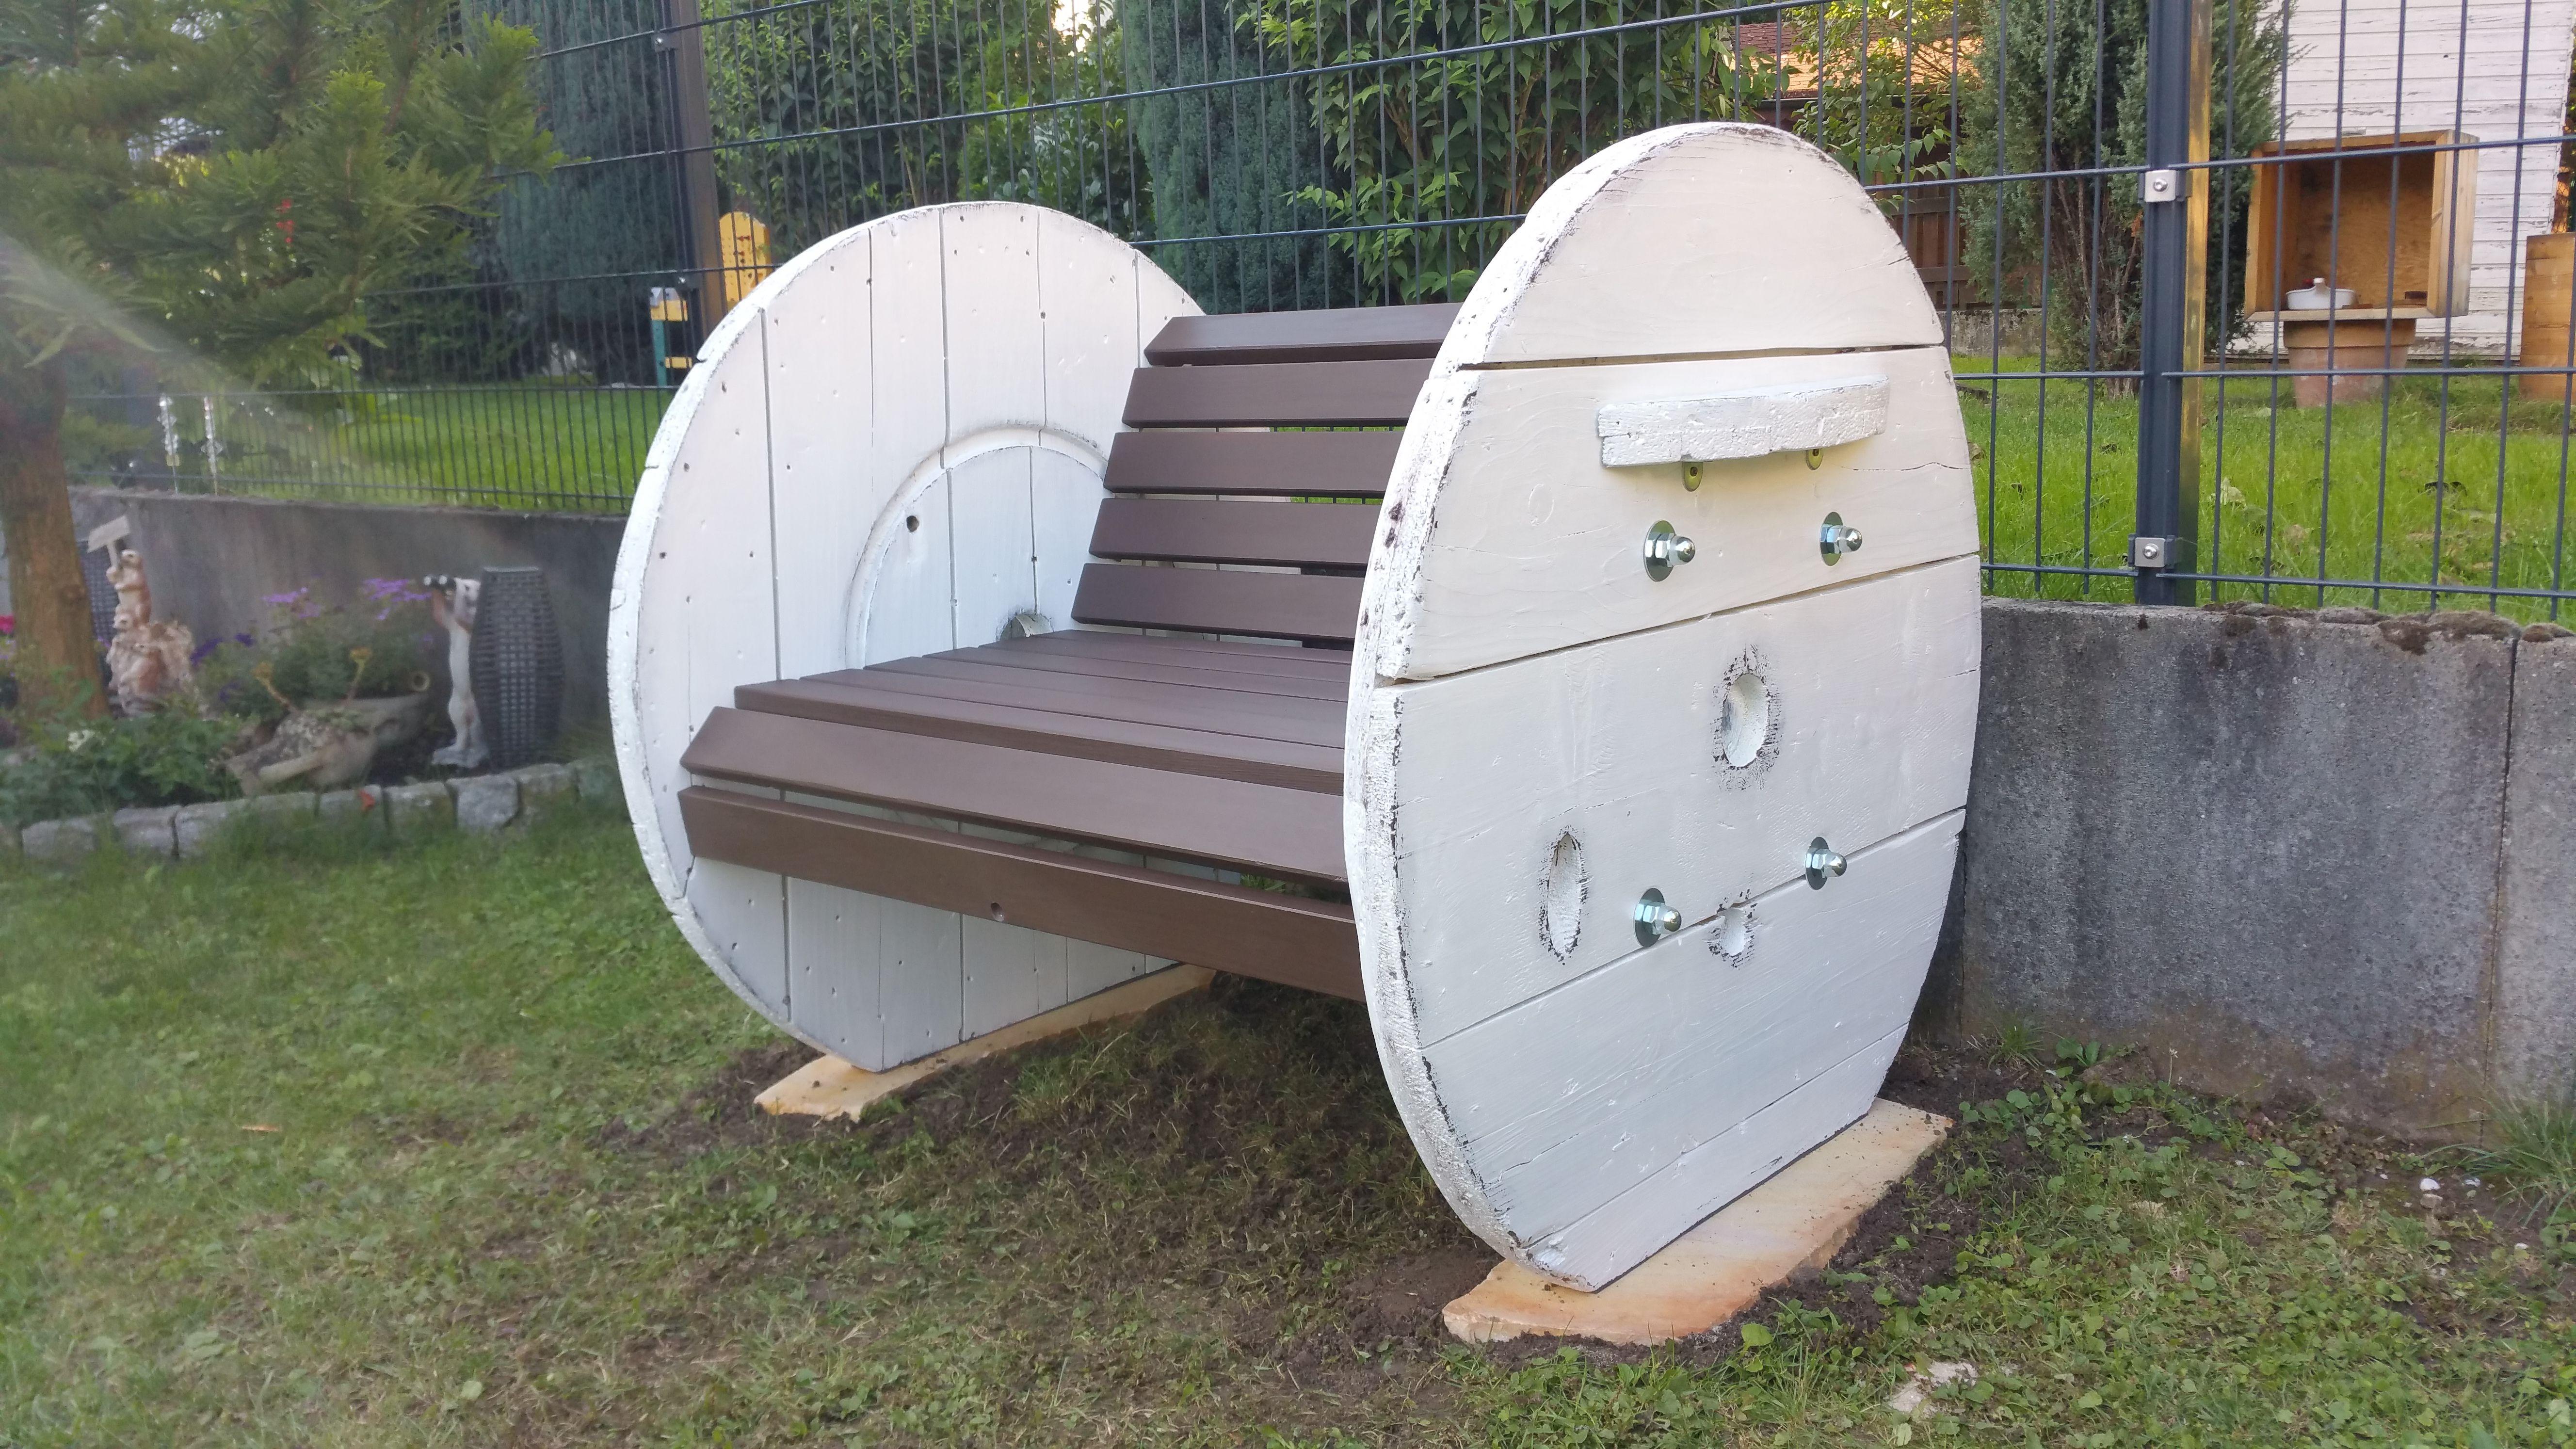 Cable Spool Kabeltrommel Gartenbank Im Farbmix Decor Outdoor Decor Outdoor